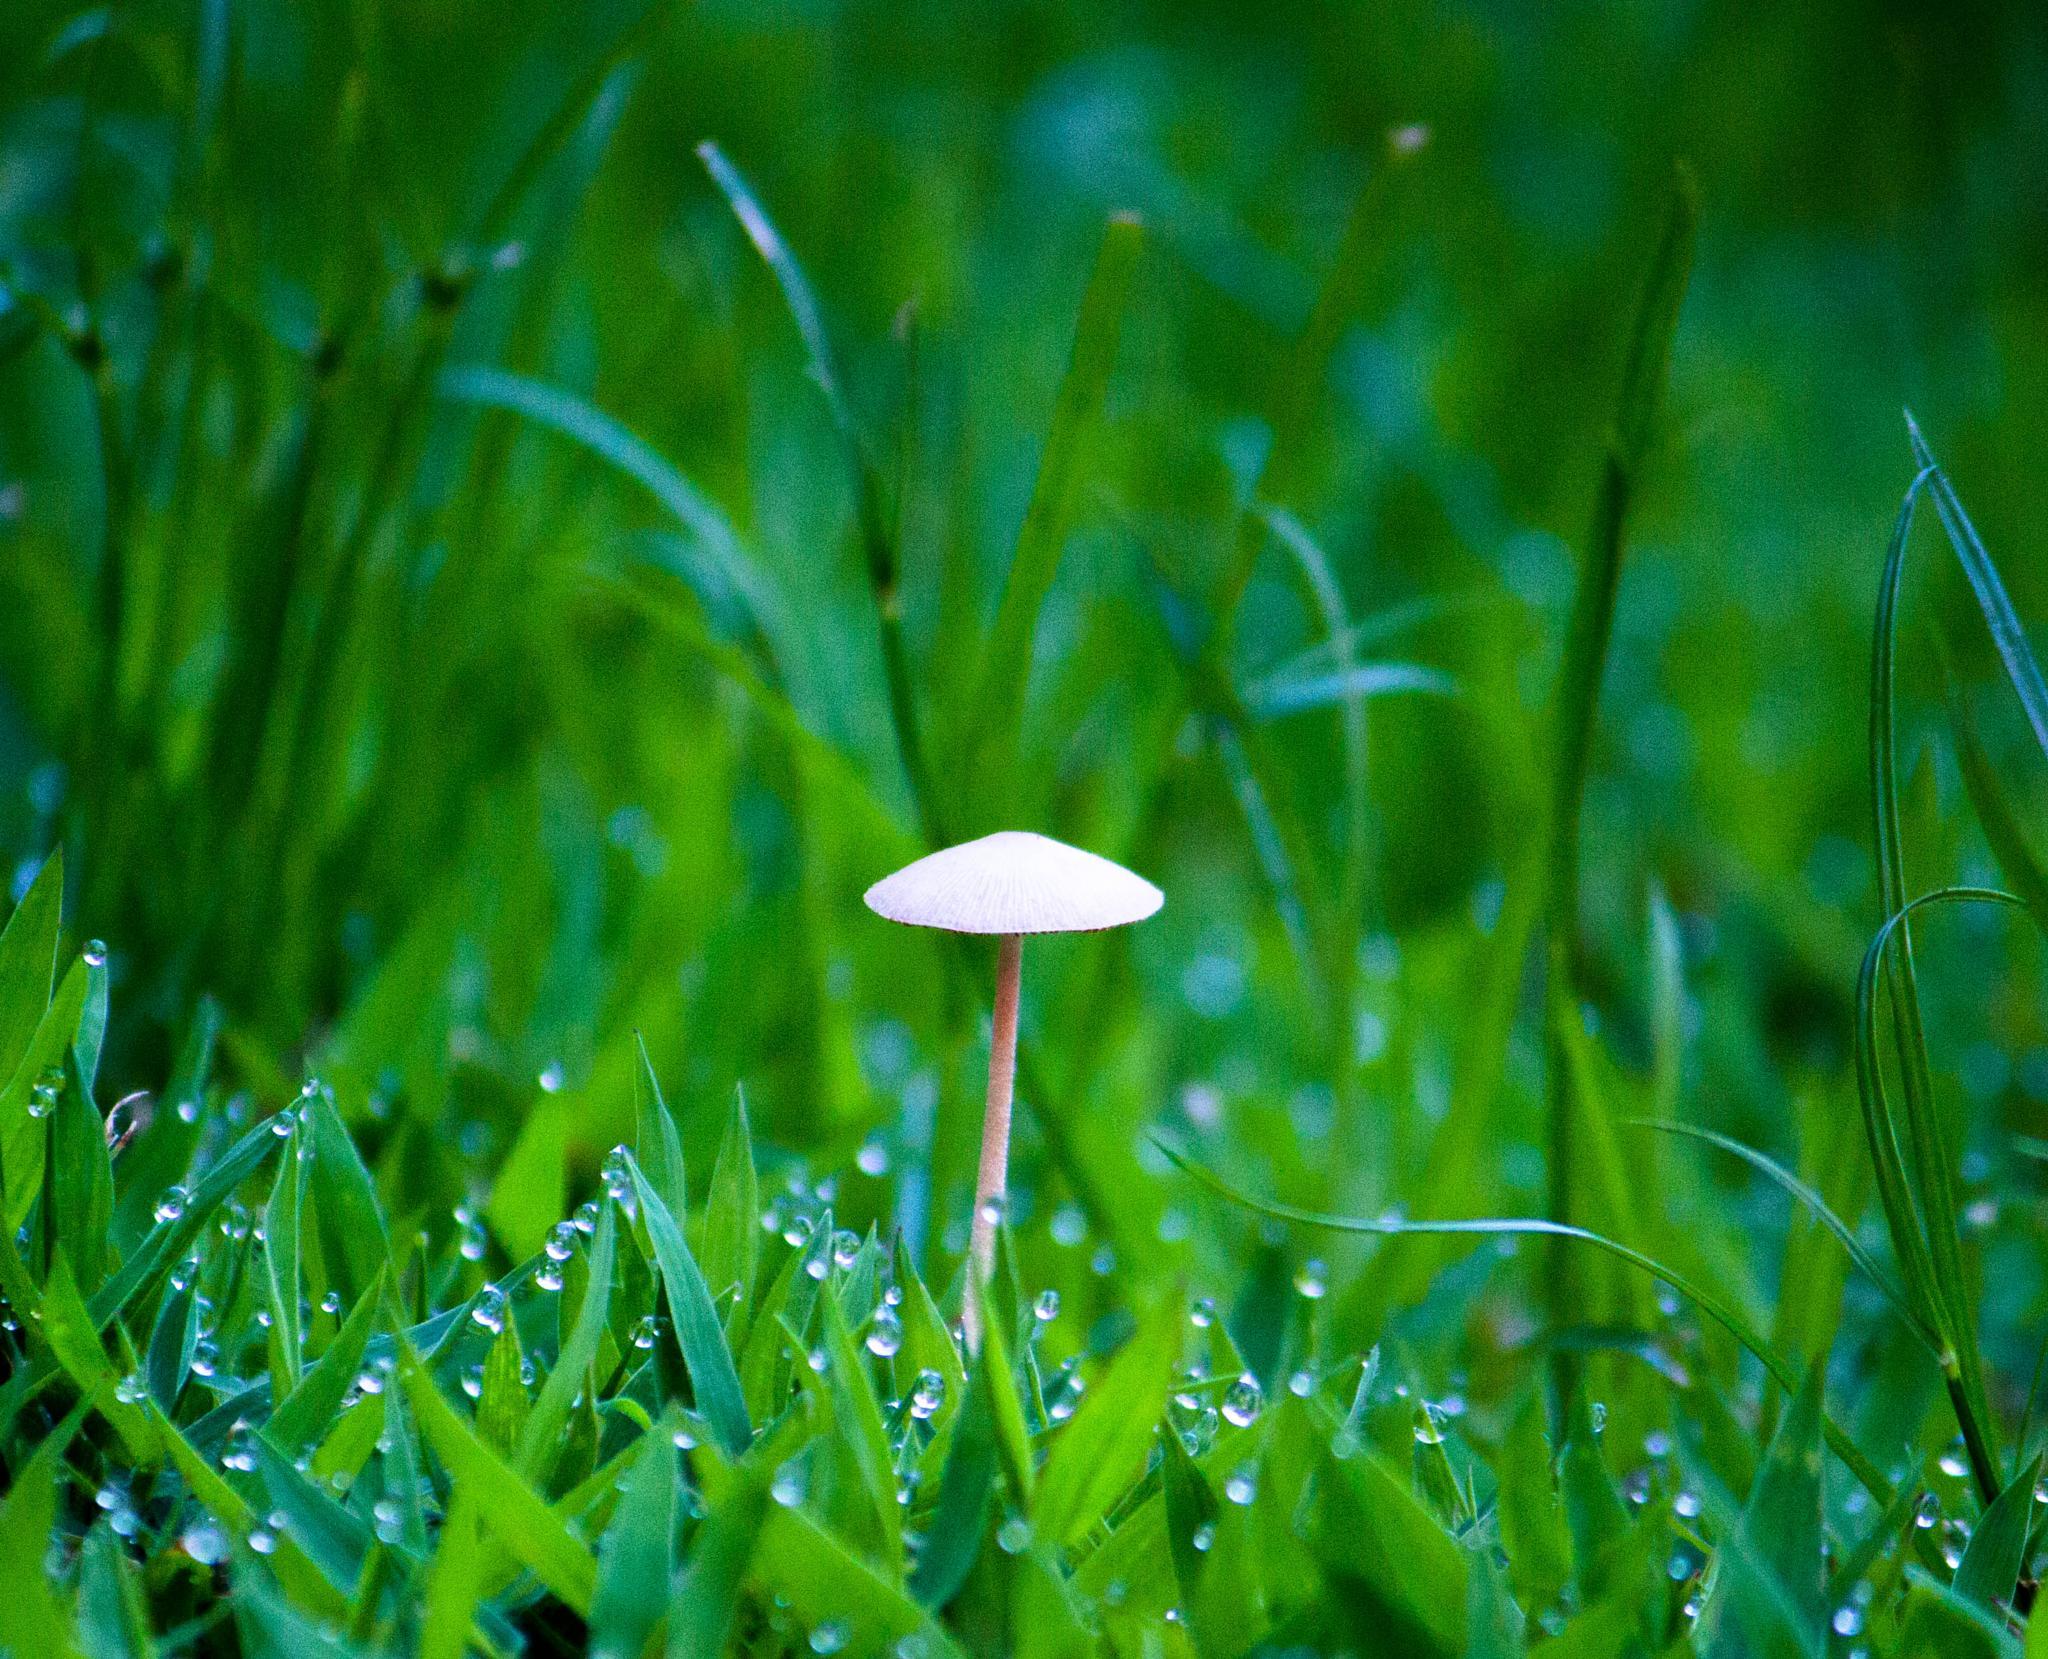 Backyard mushroom by ada.varona